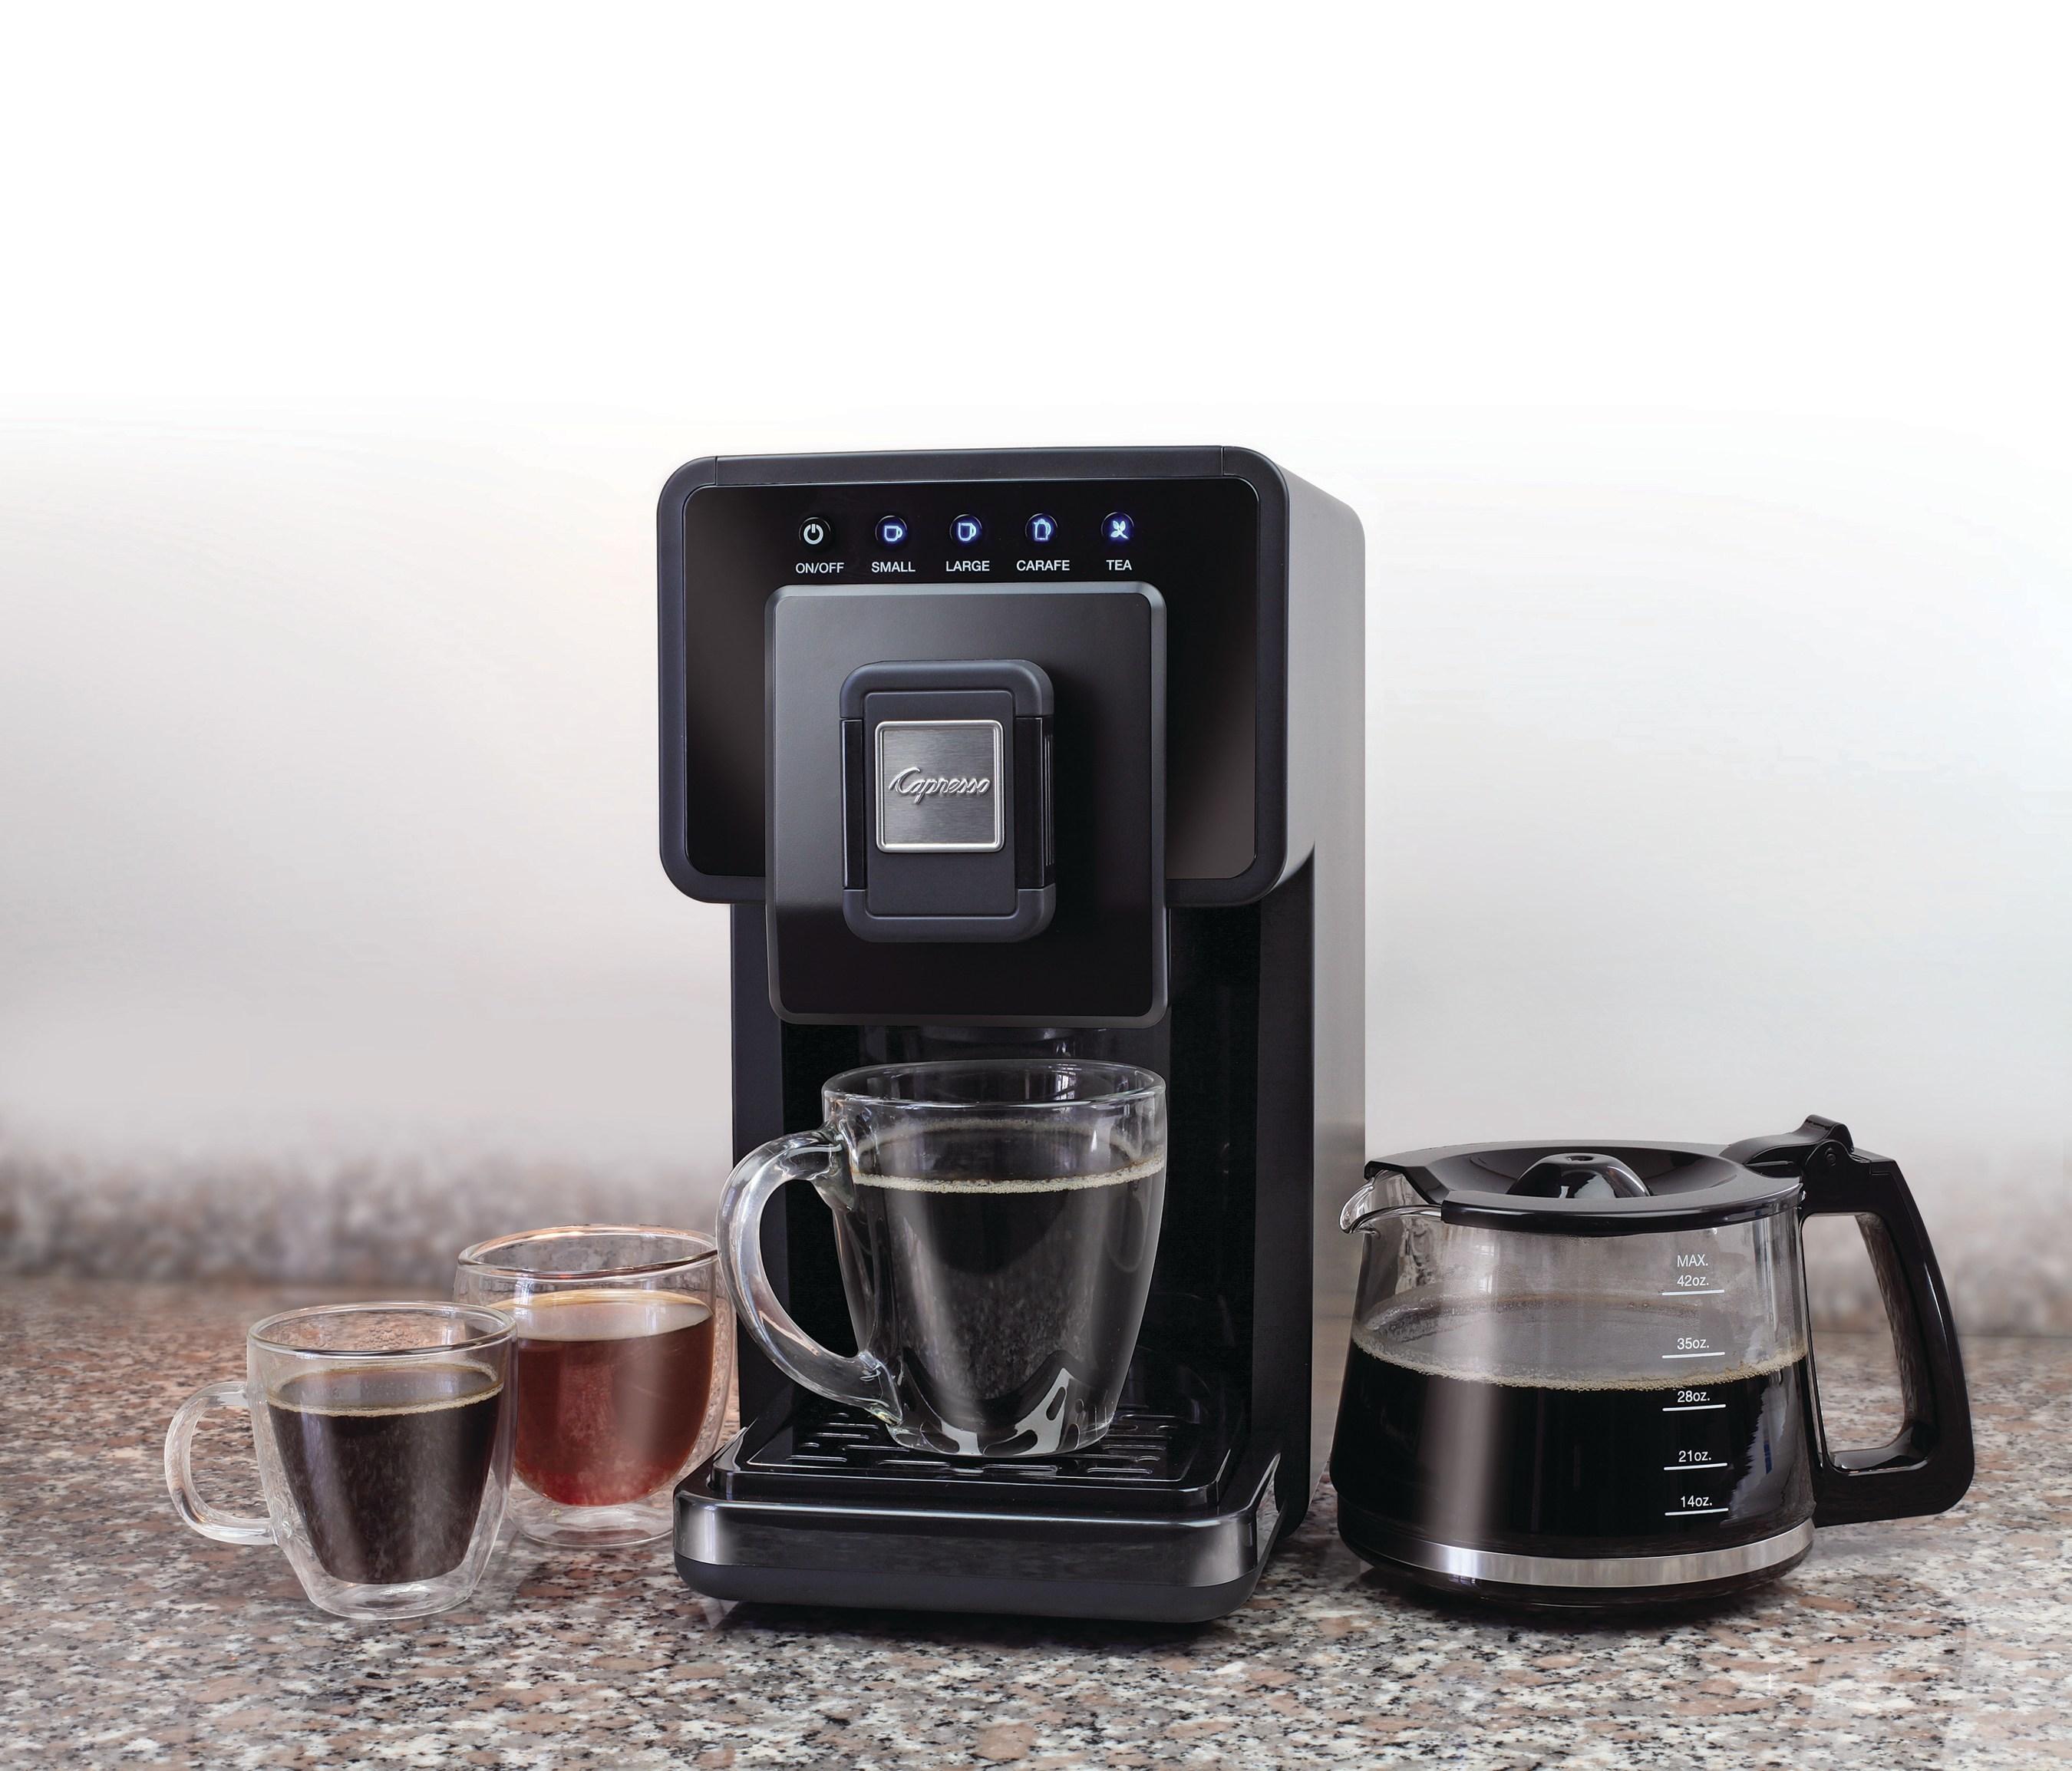 New Capresso Triple Brew Coffee & Tea Maker